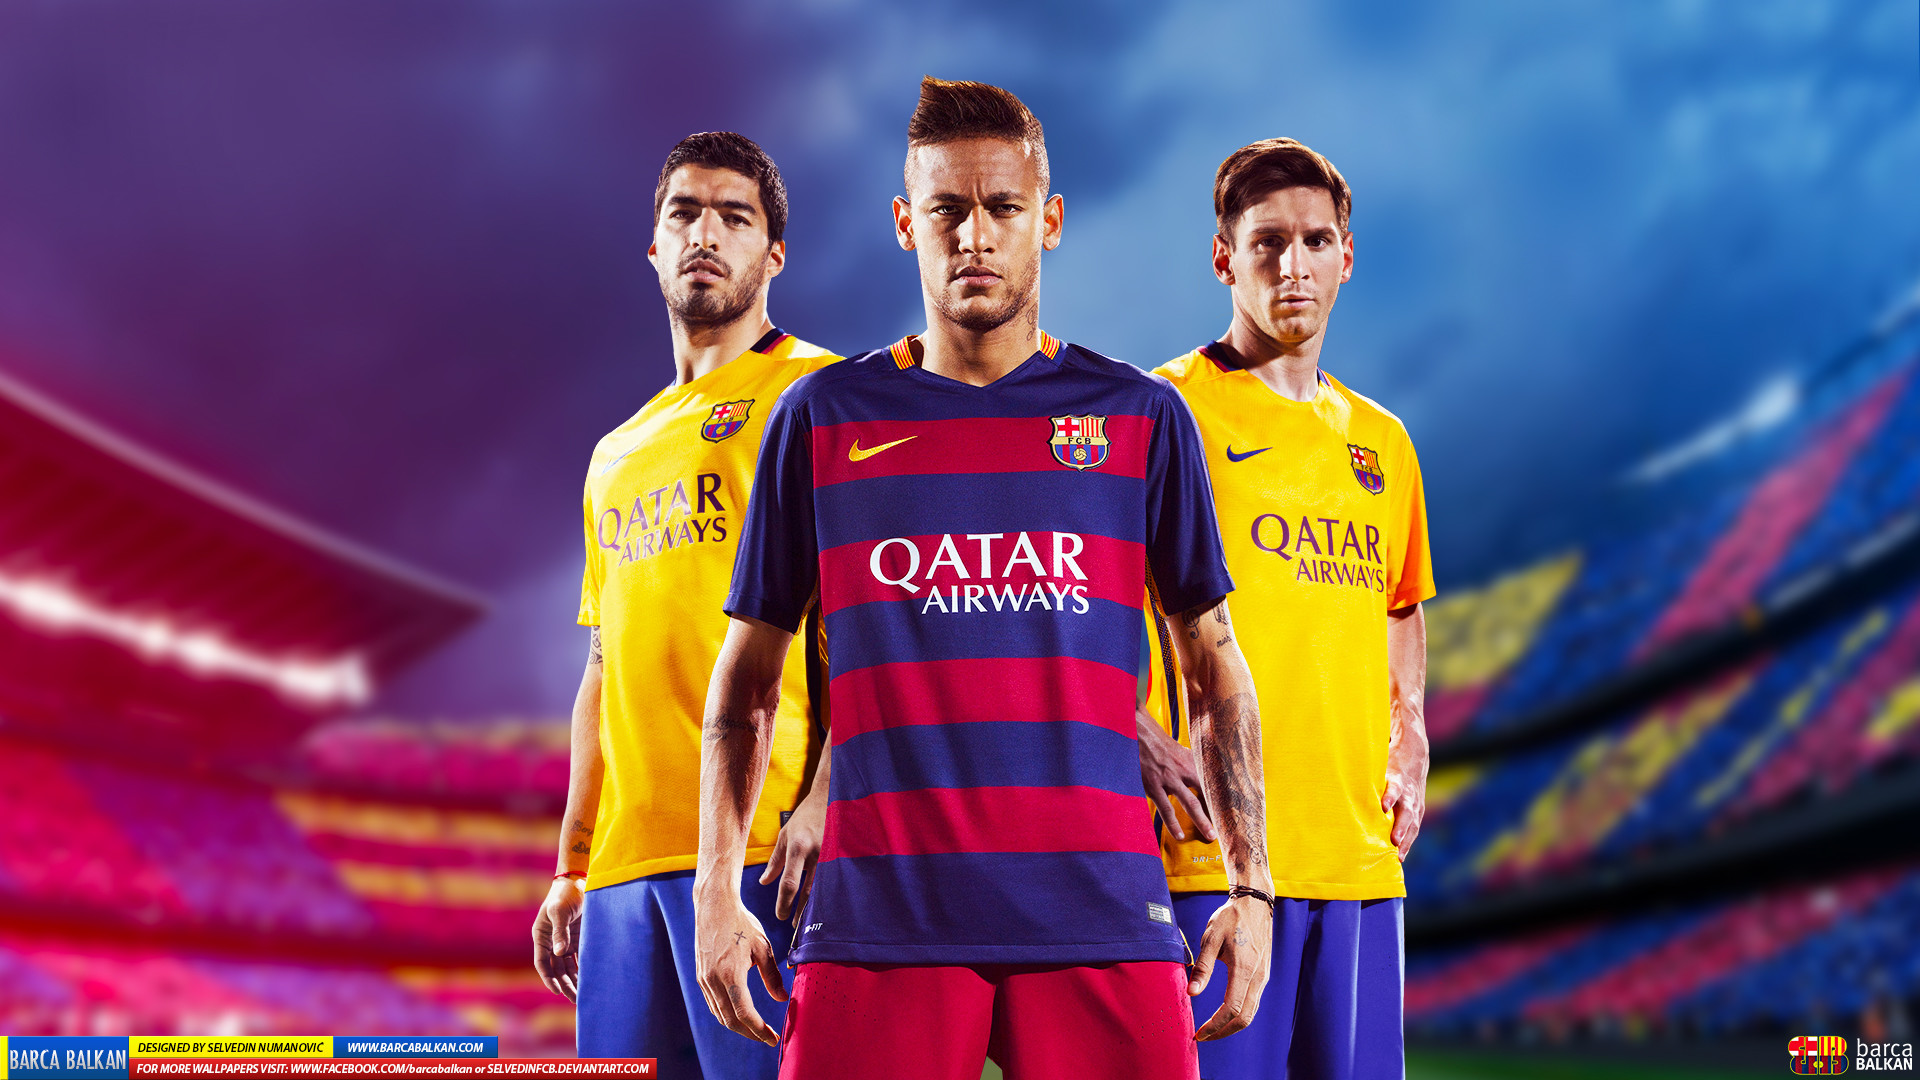 Messi Neymar Suarez Wallpaper